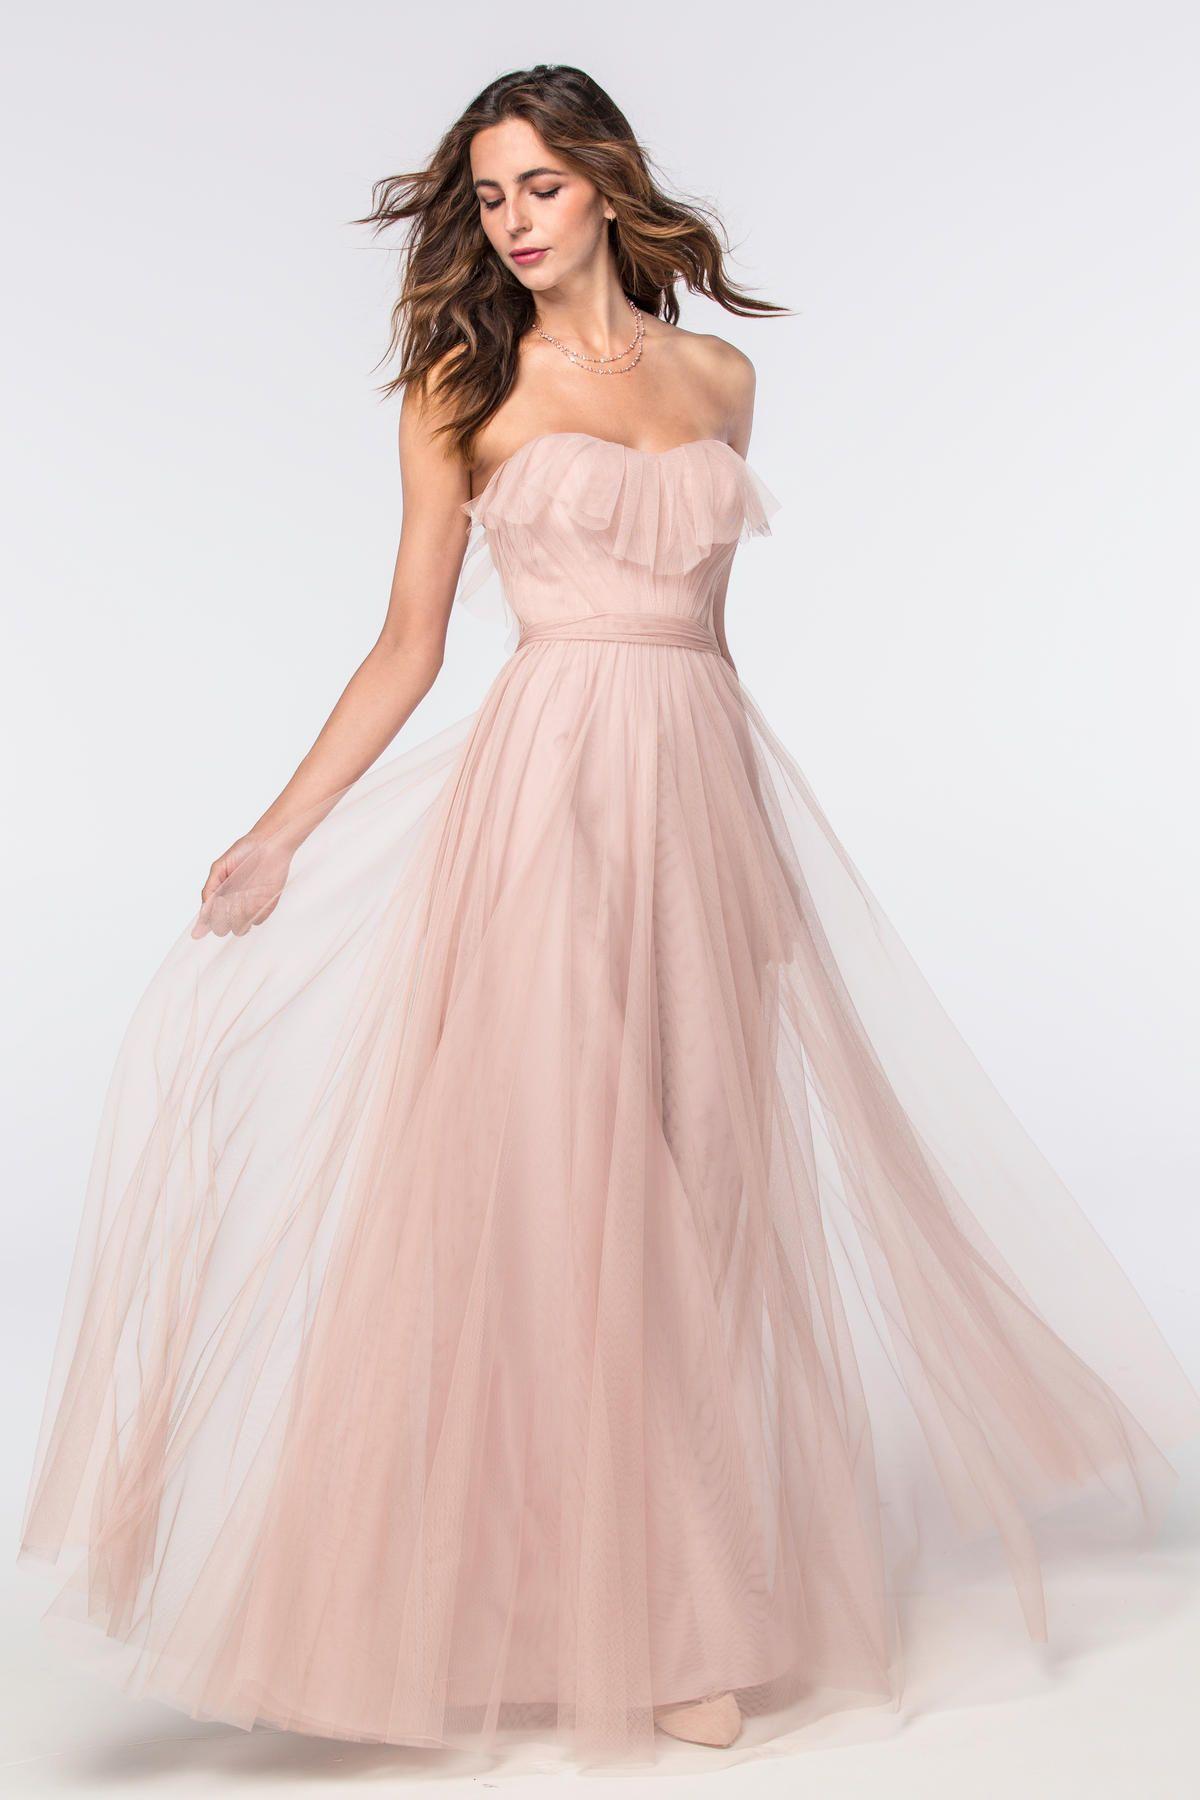 Angelie 2304 | Bridesmaids | Watters | Bridesmaid Dresses | Pinterest